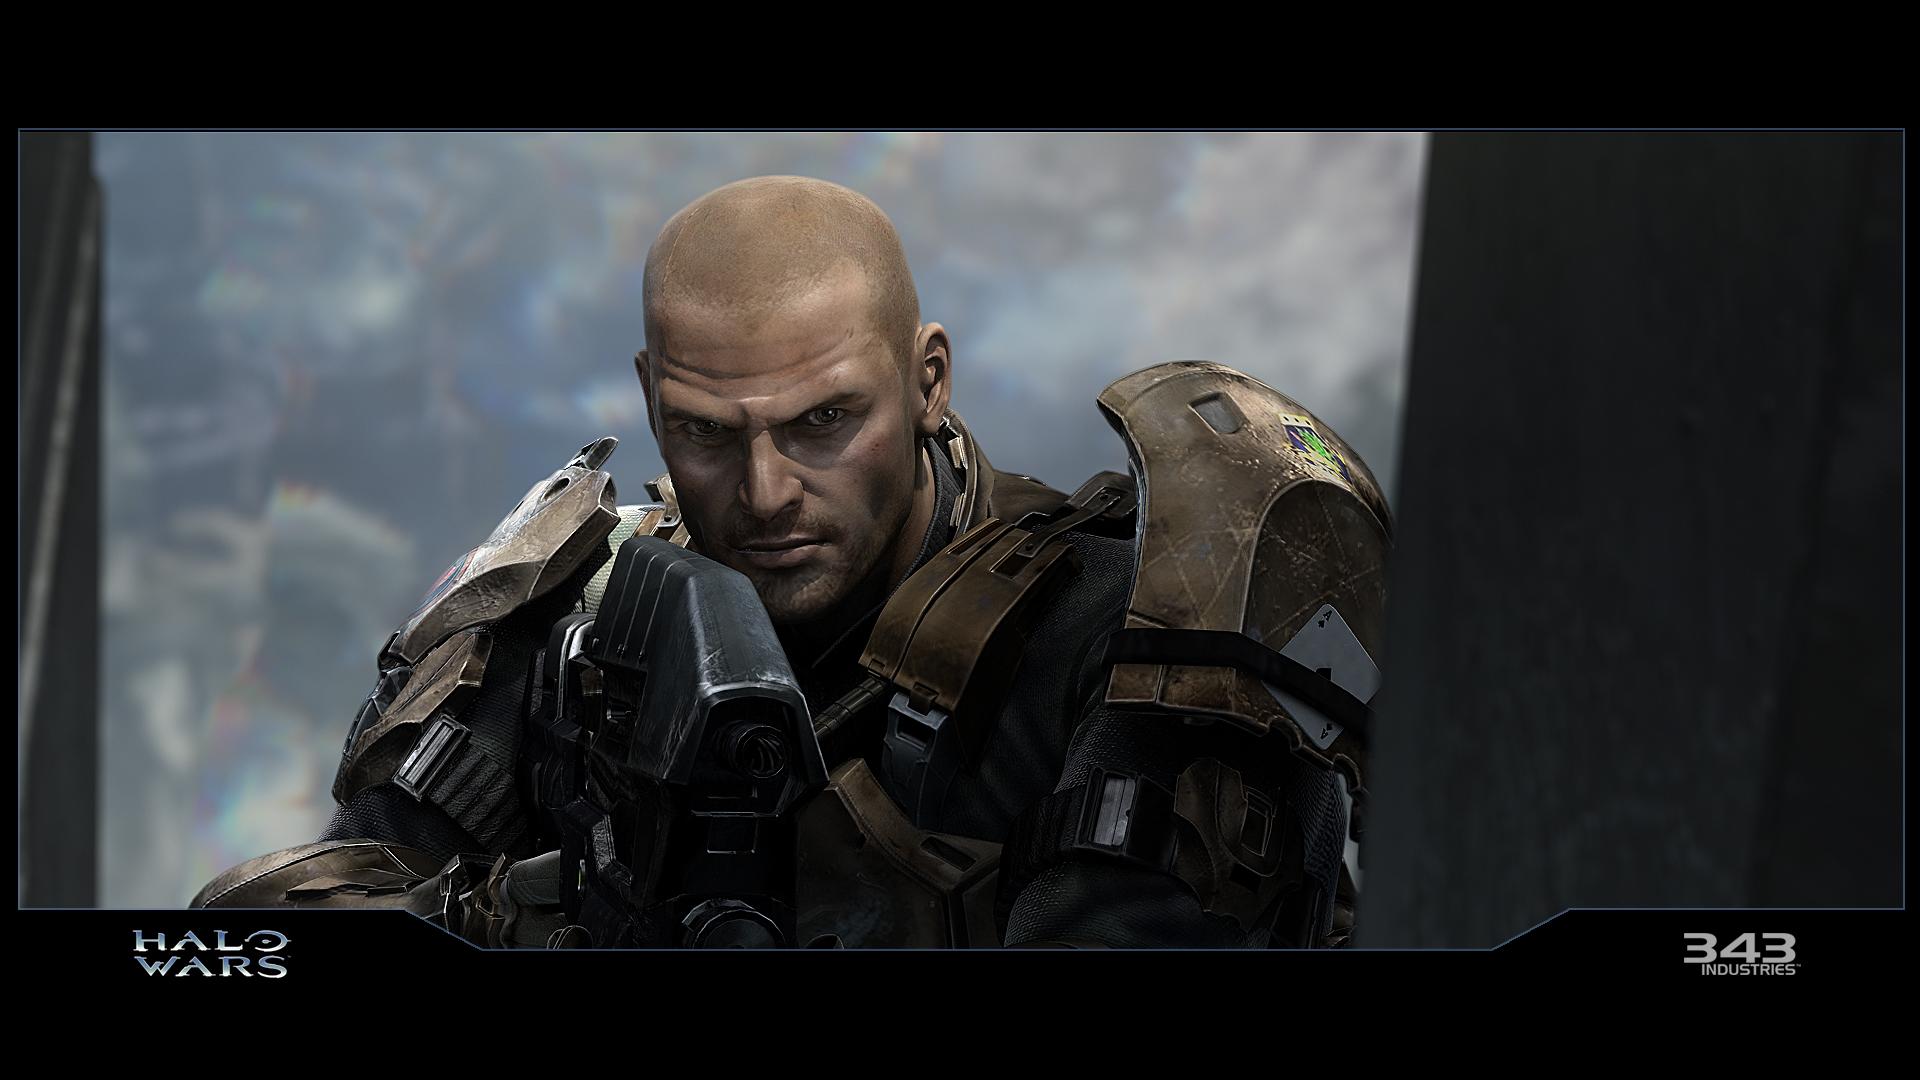 Meet Sergeant Forge